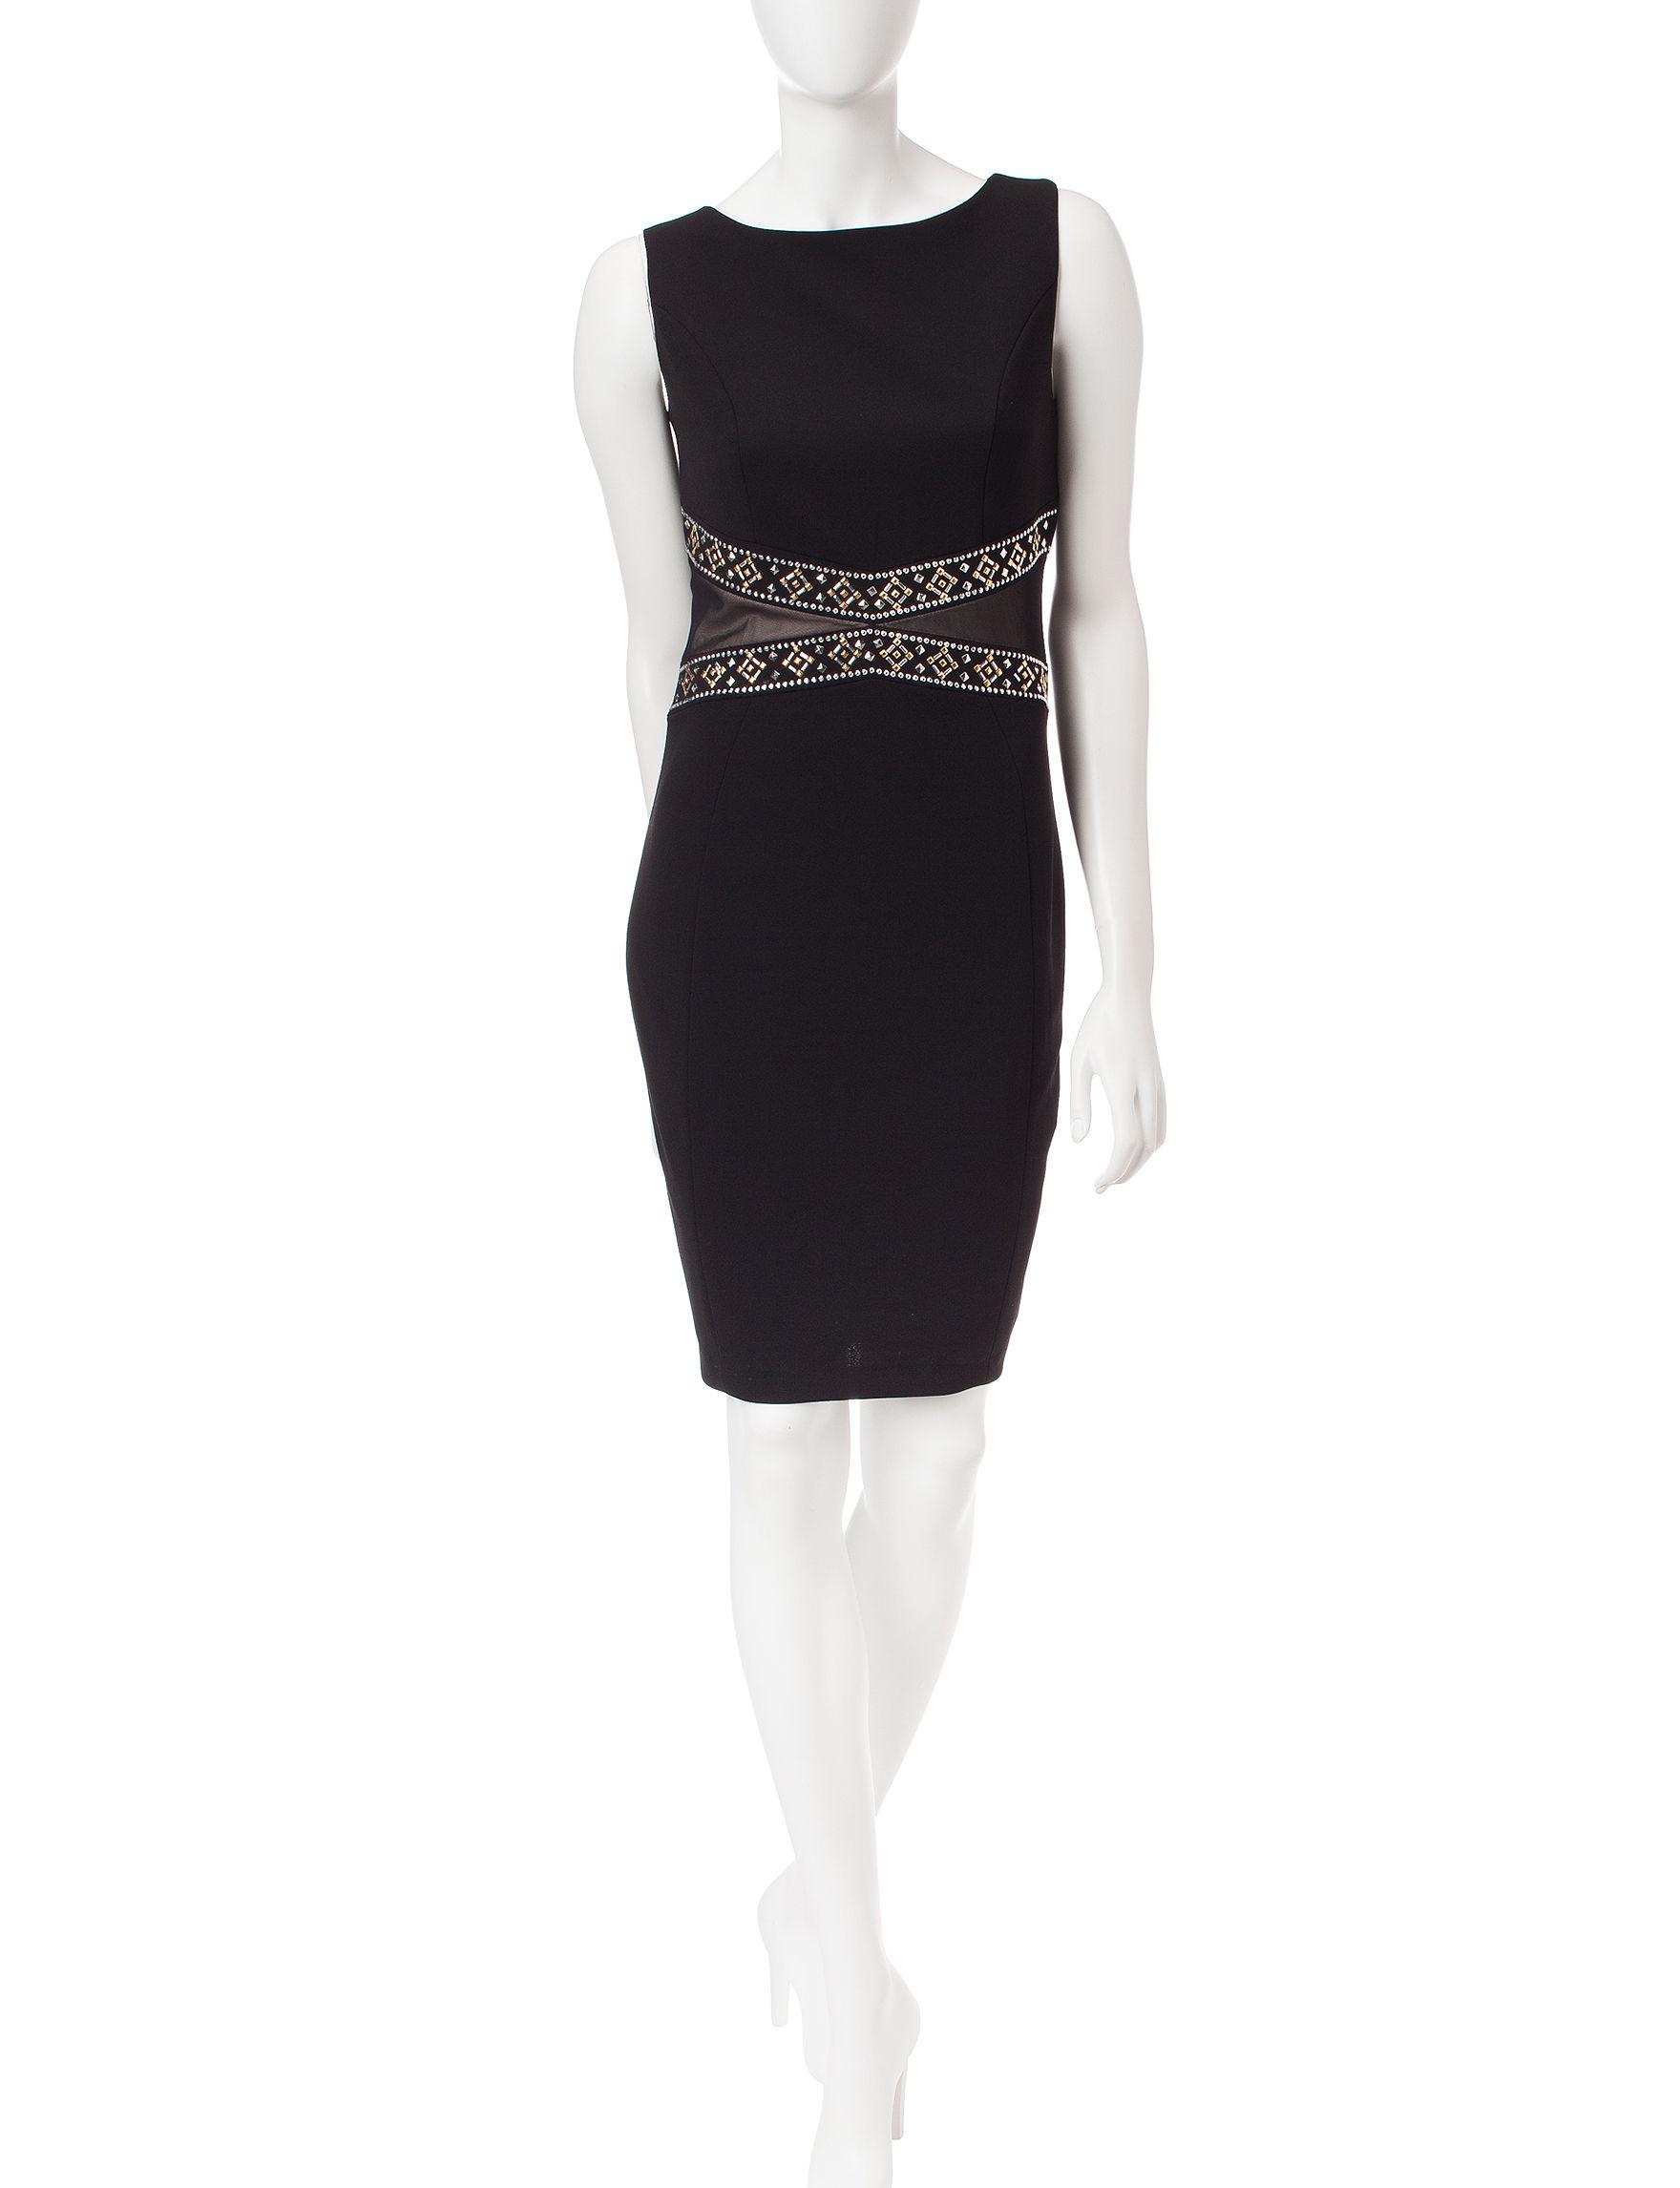 Sangria Black Cocktail & Party Evening & Formal Sheath Dresses